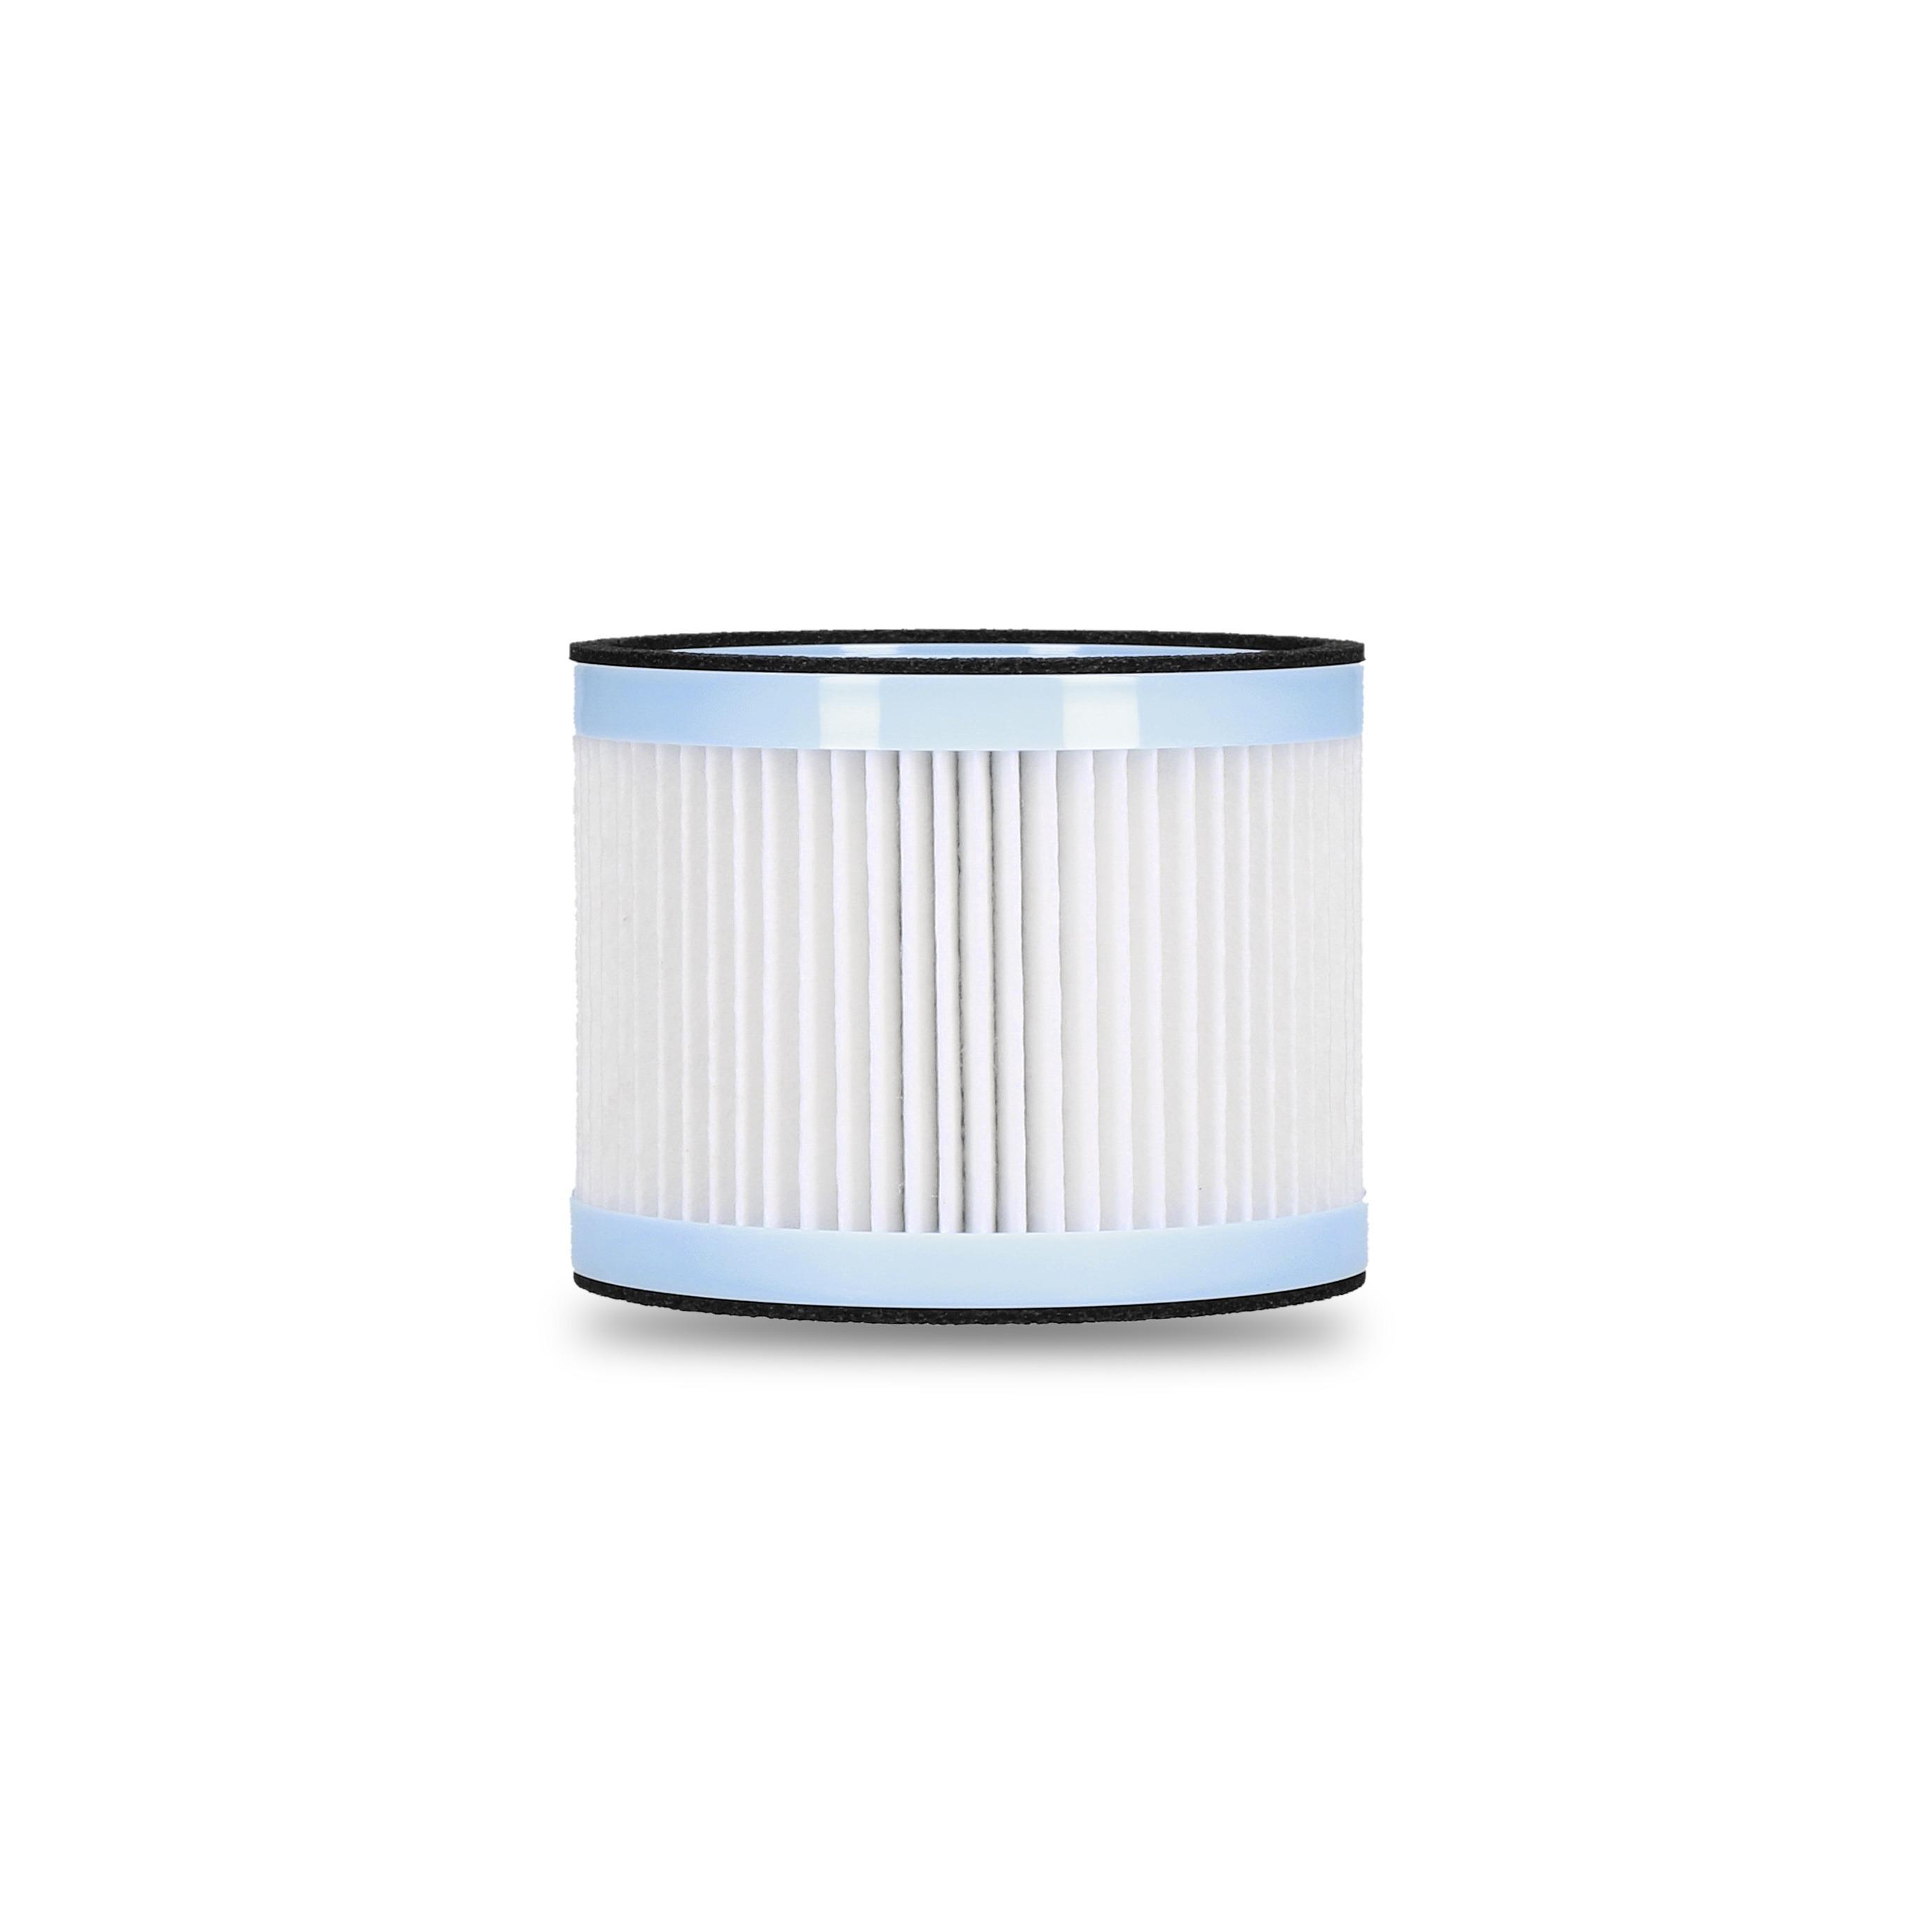 Duux Filter for Sphere Air Purifier HEPA + Carbon Klimaat accessoire